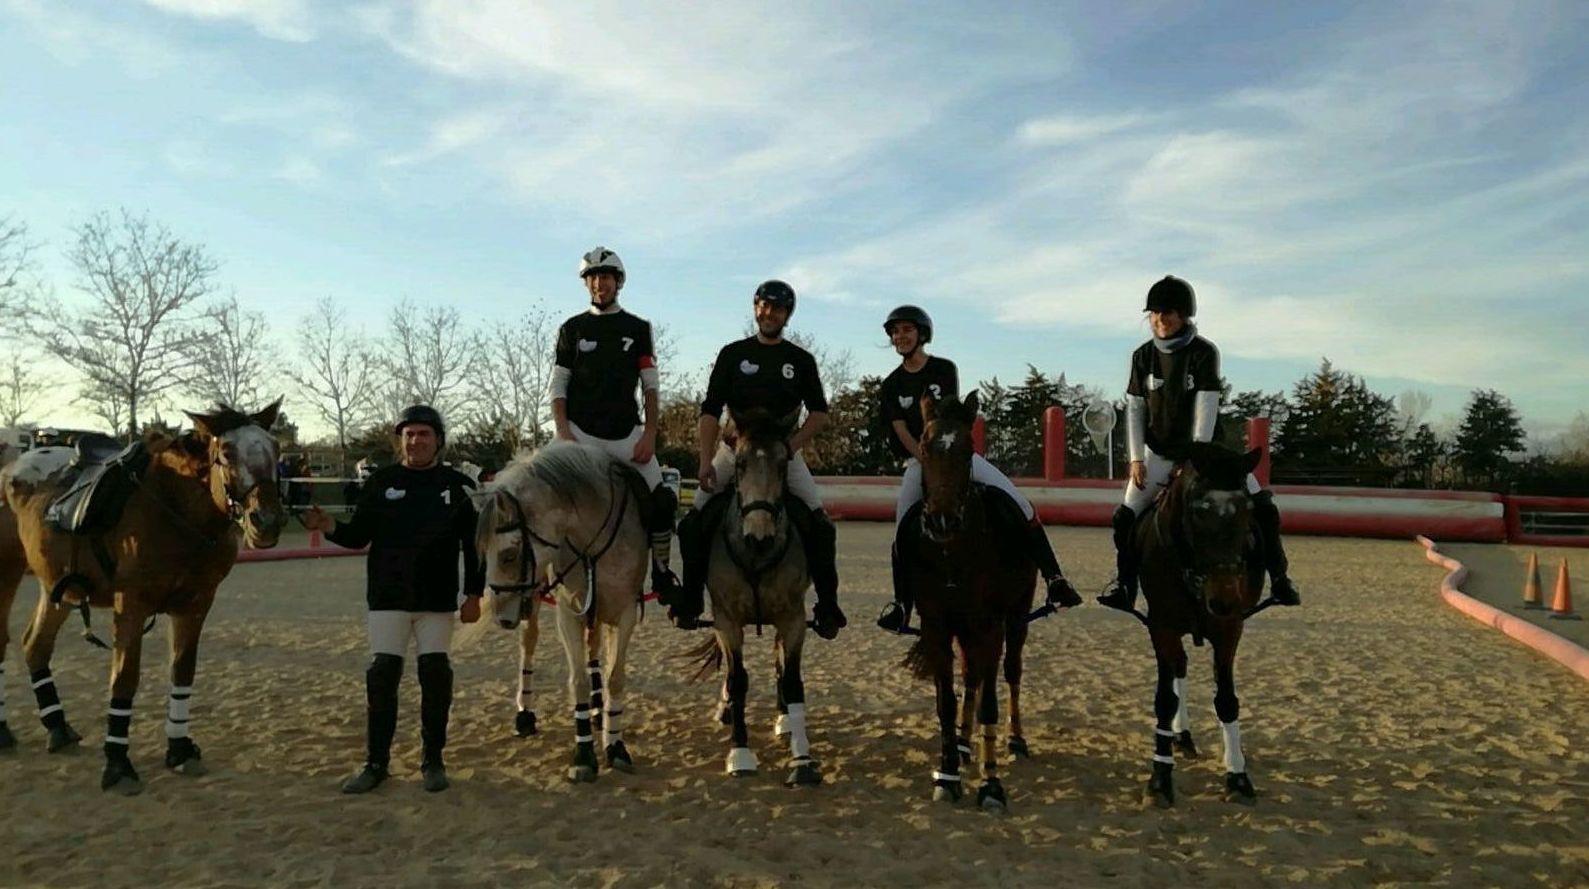 La perla negra horseball team resurge tras aguas turbulentas.